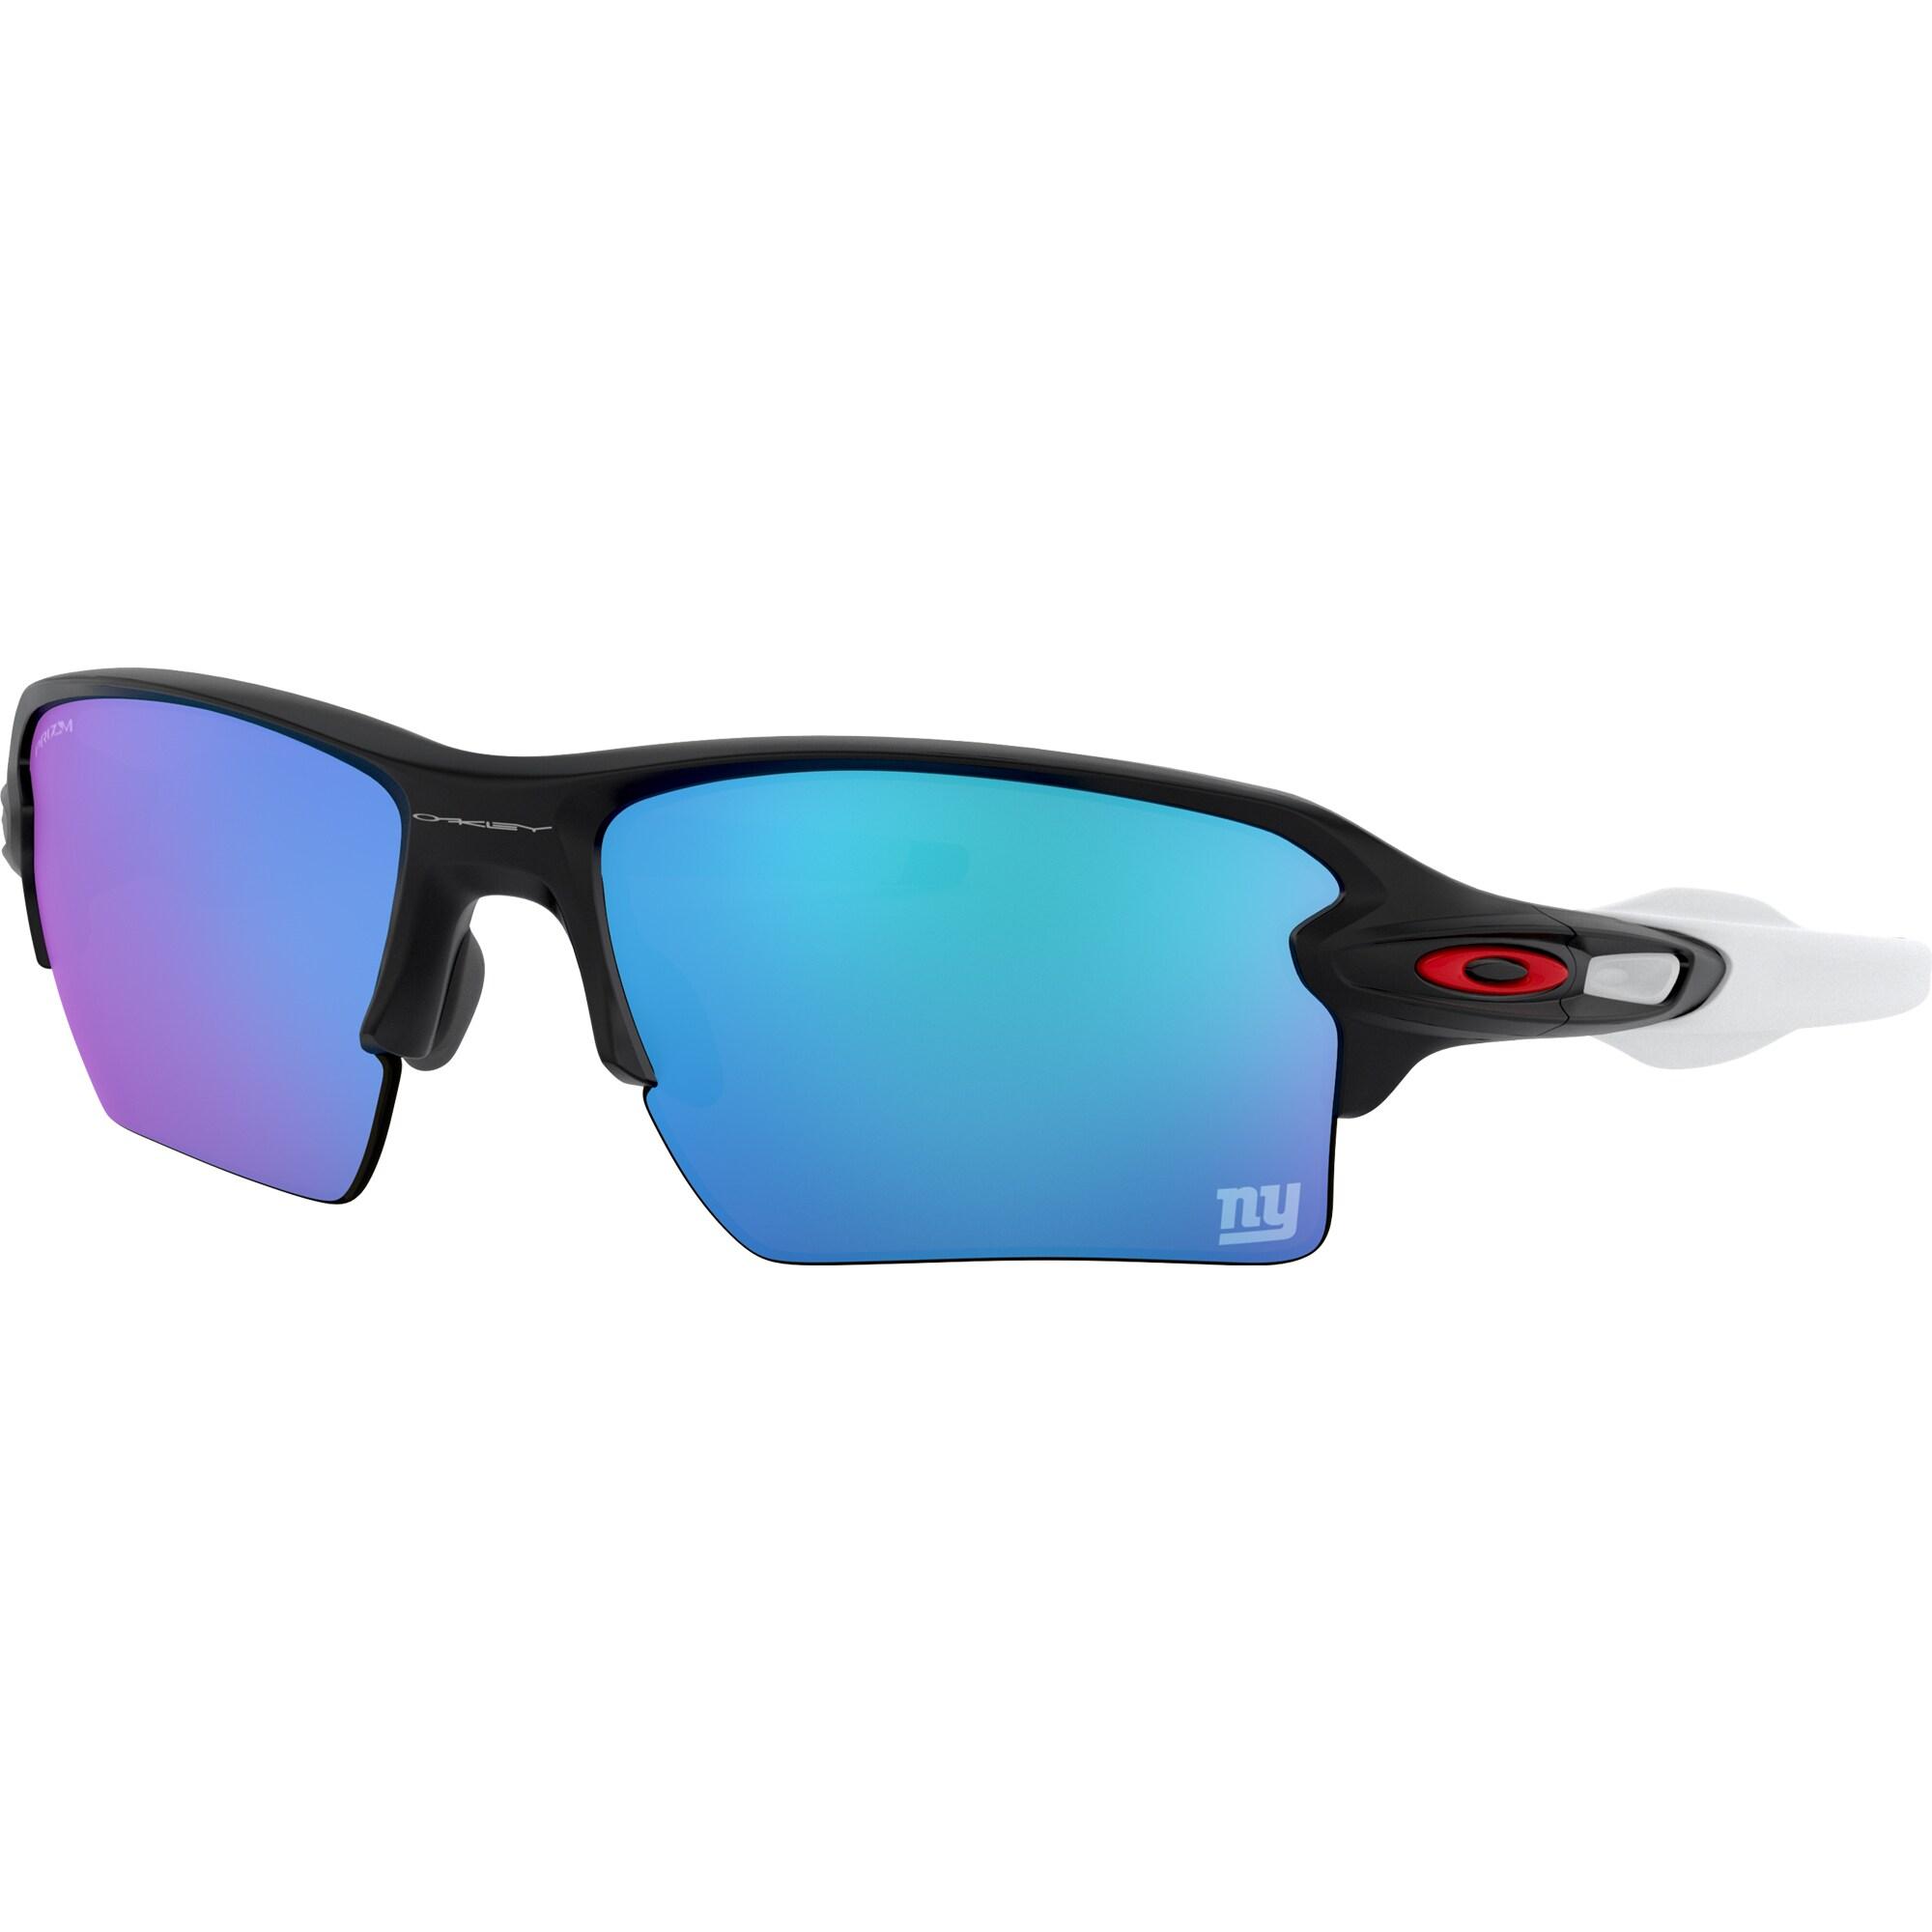 New York Giants Oakley Flak 2.0 XL Sunglasses